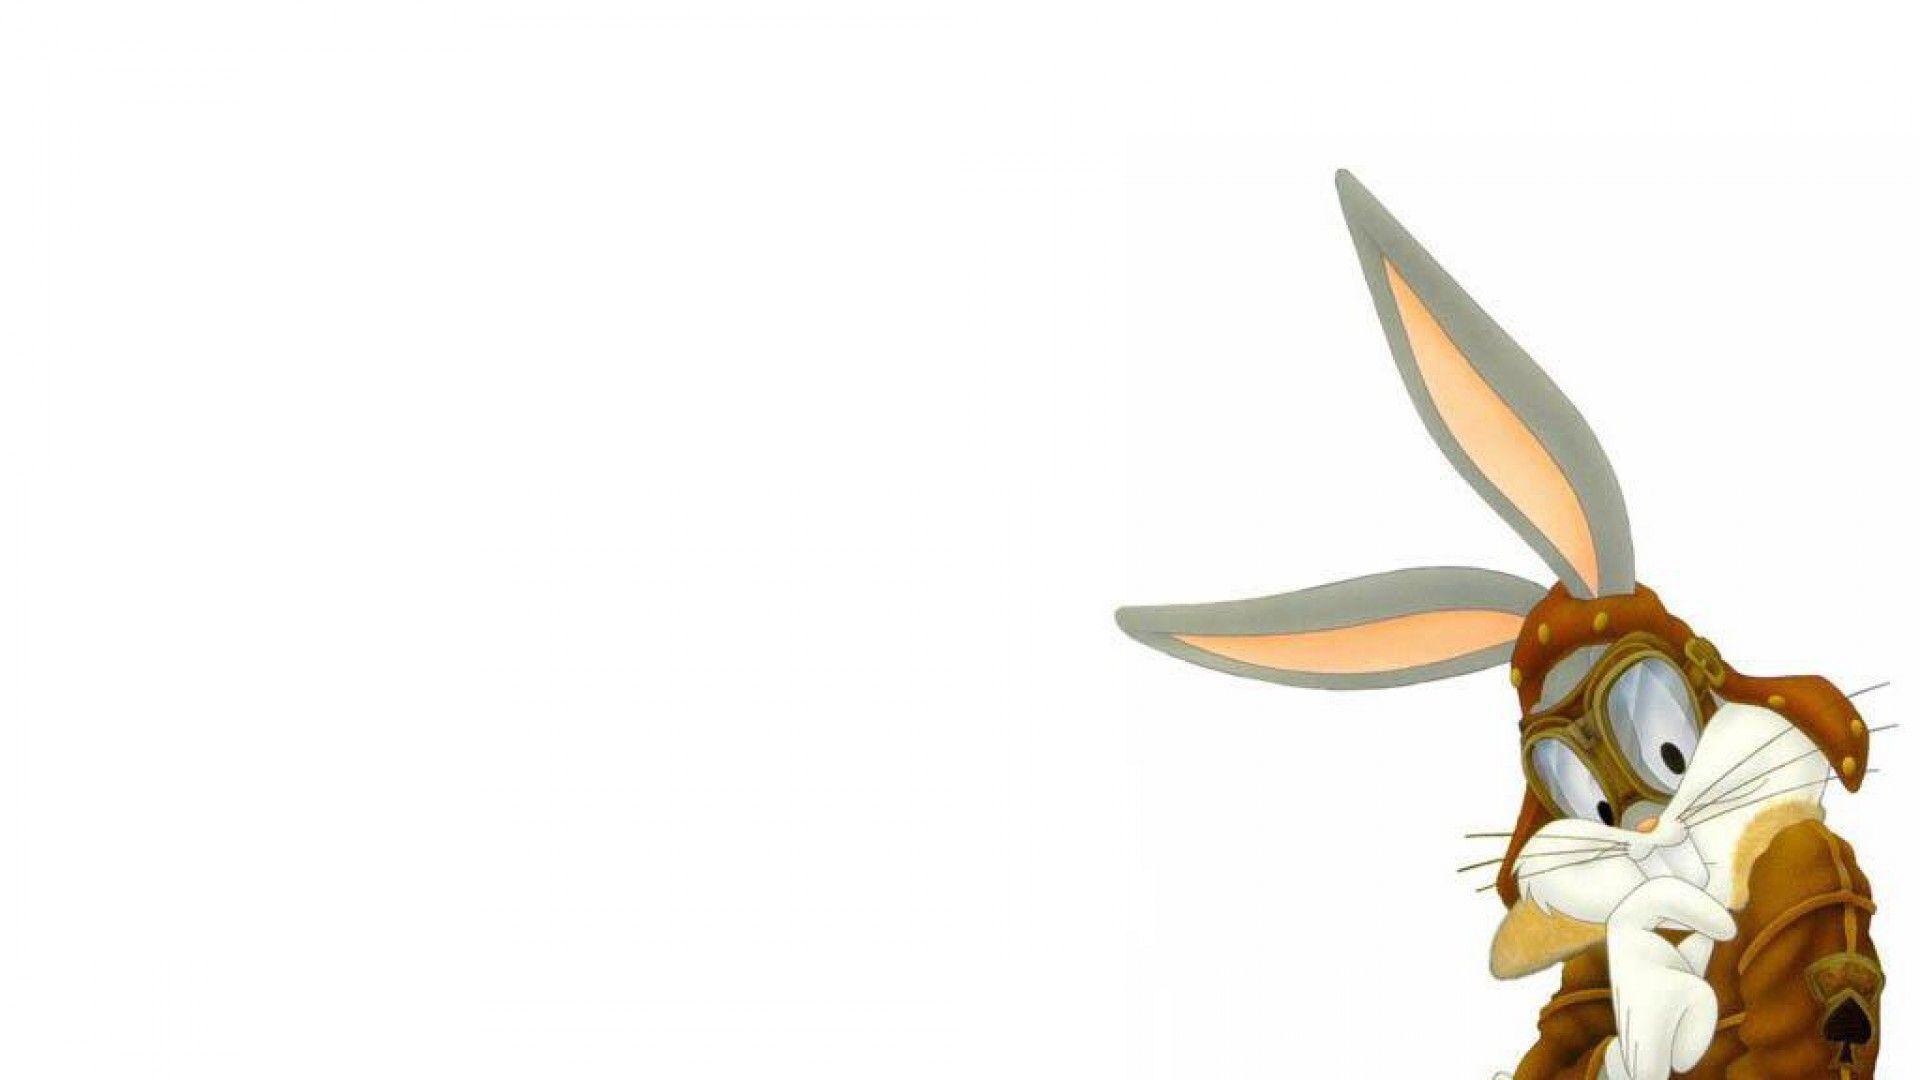 Bugs Bunny Wallpaper Android Phones 9907 Wallpaper